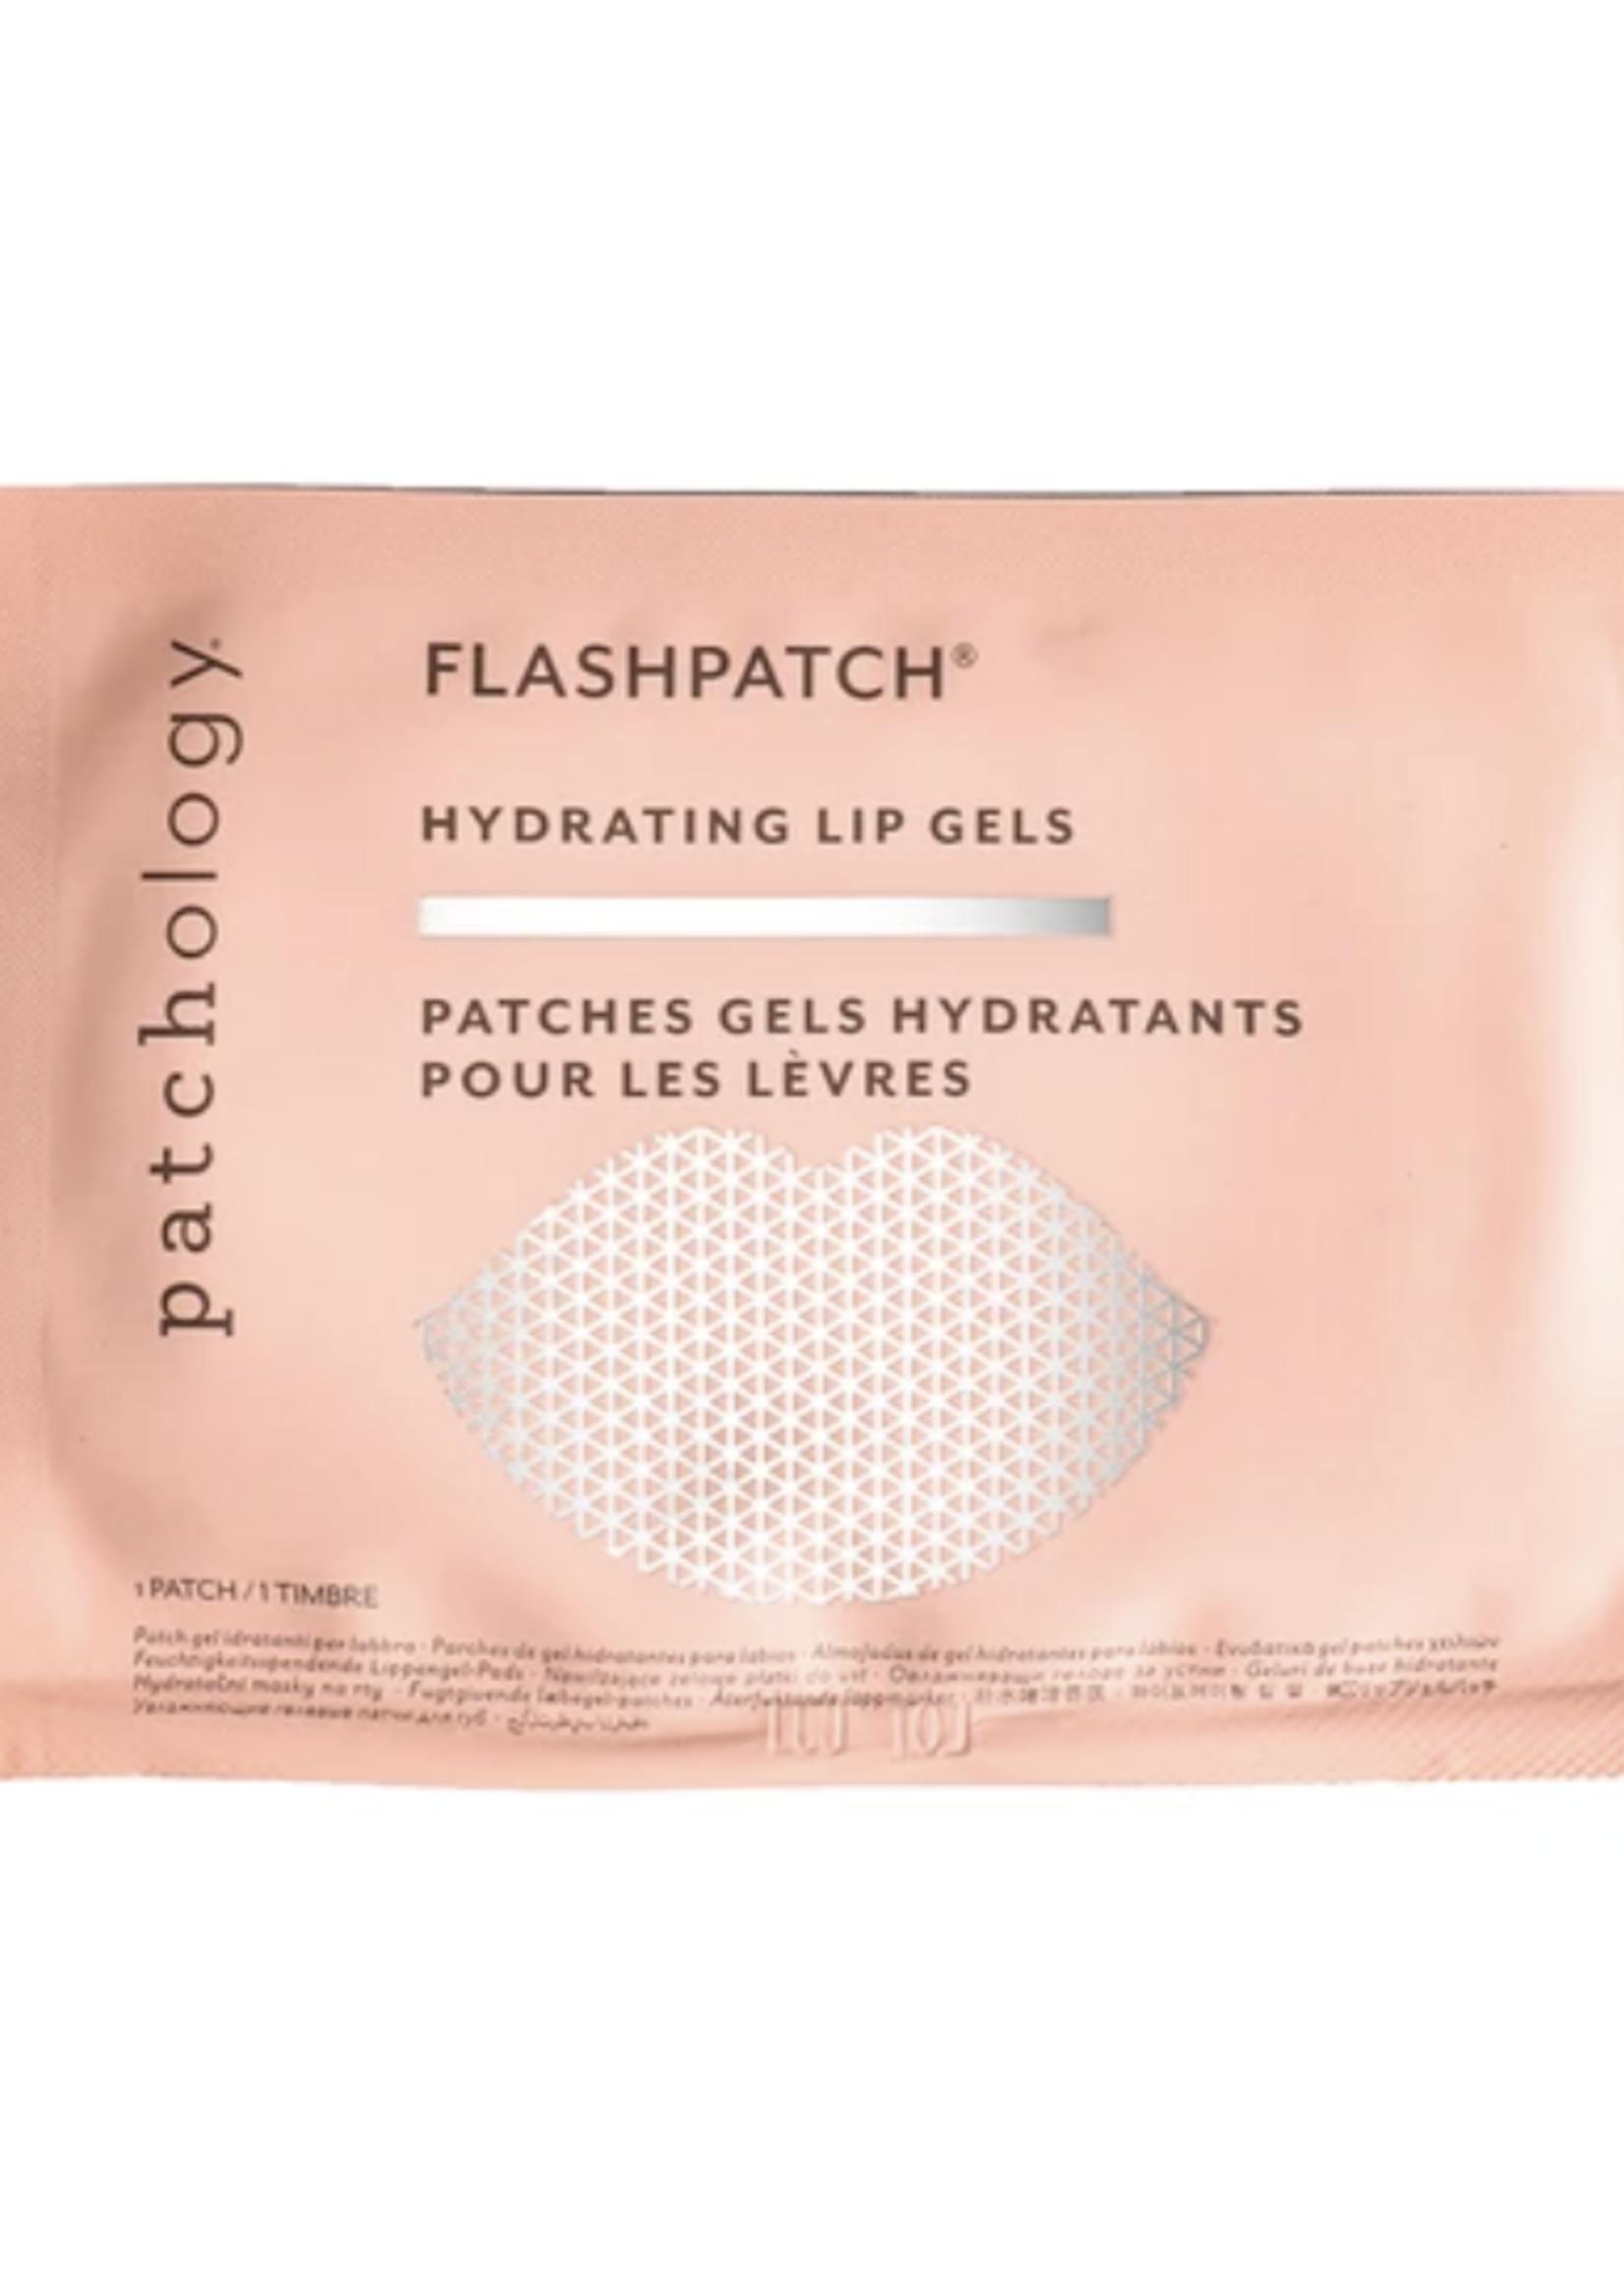 Patchology Flashpatch  Hydrating Lip Gels